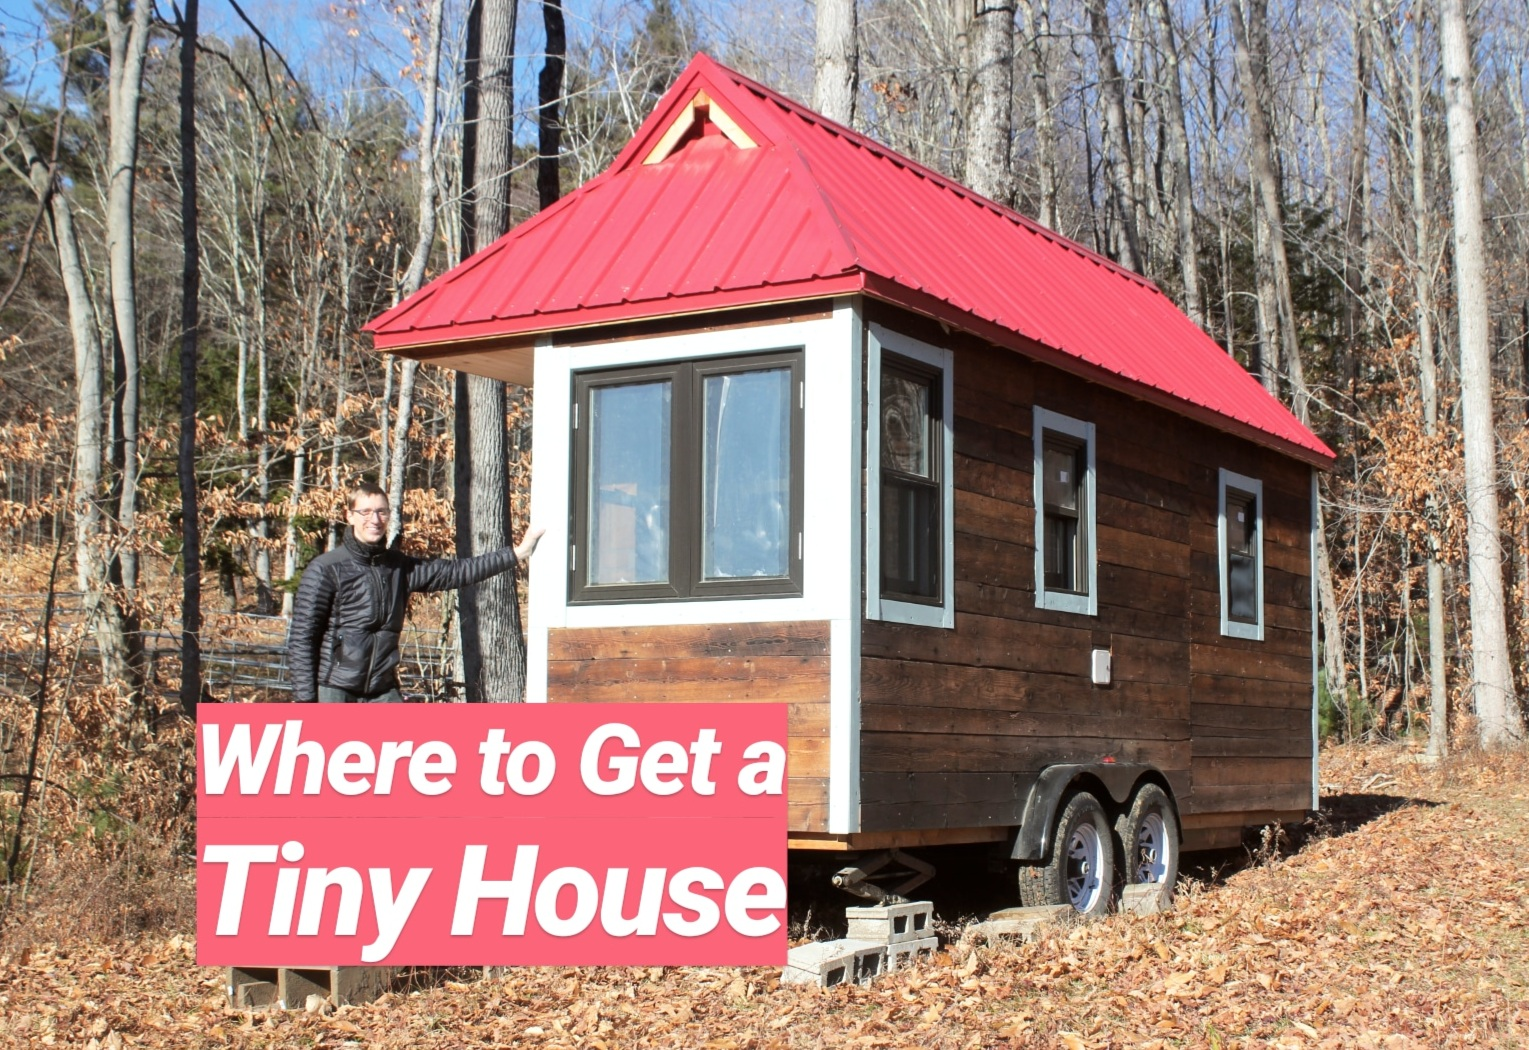 where-to-get-a-tiny-house.jpg